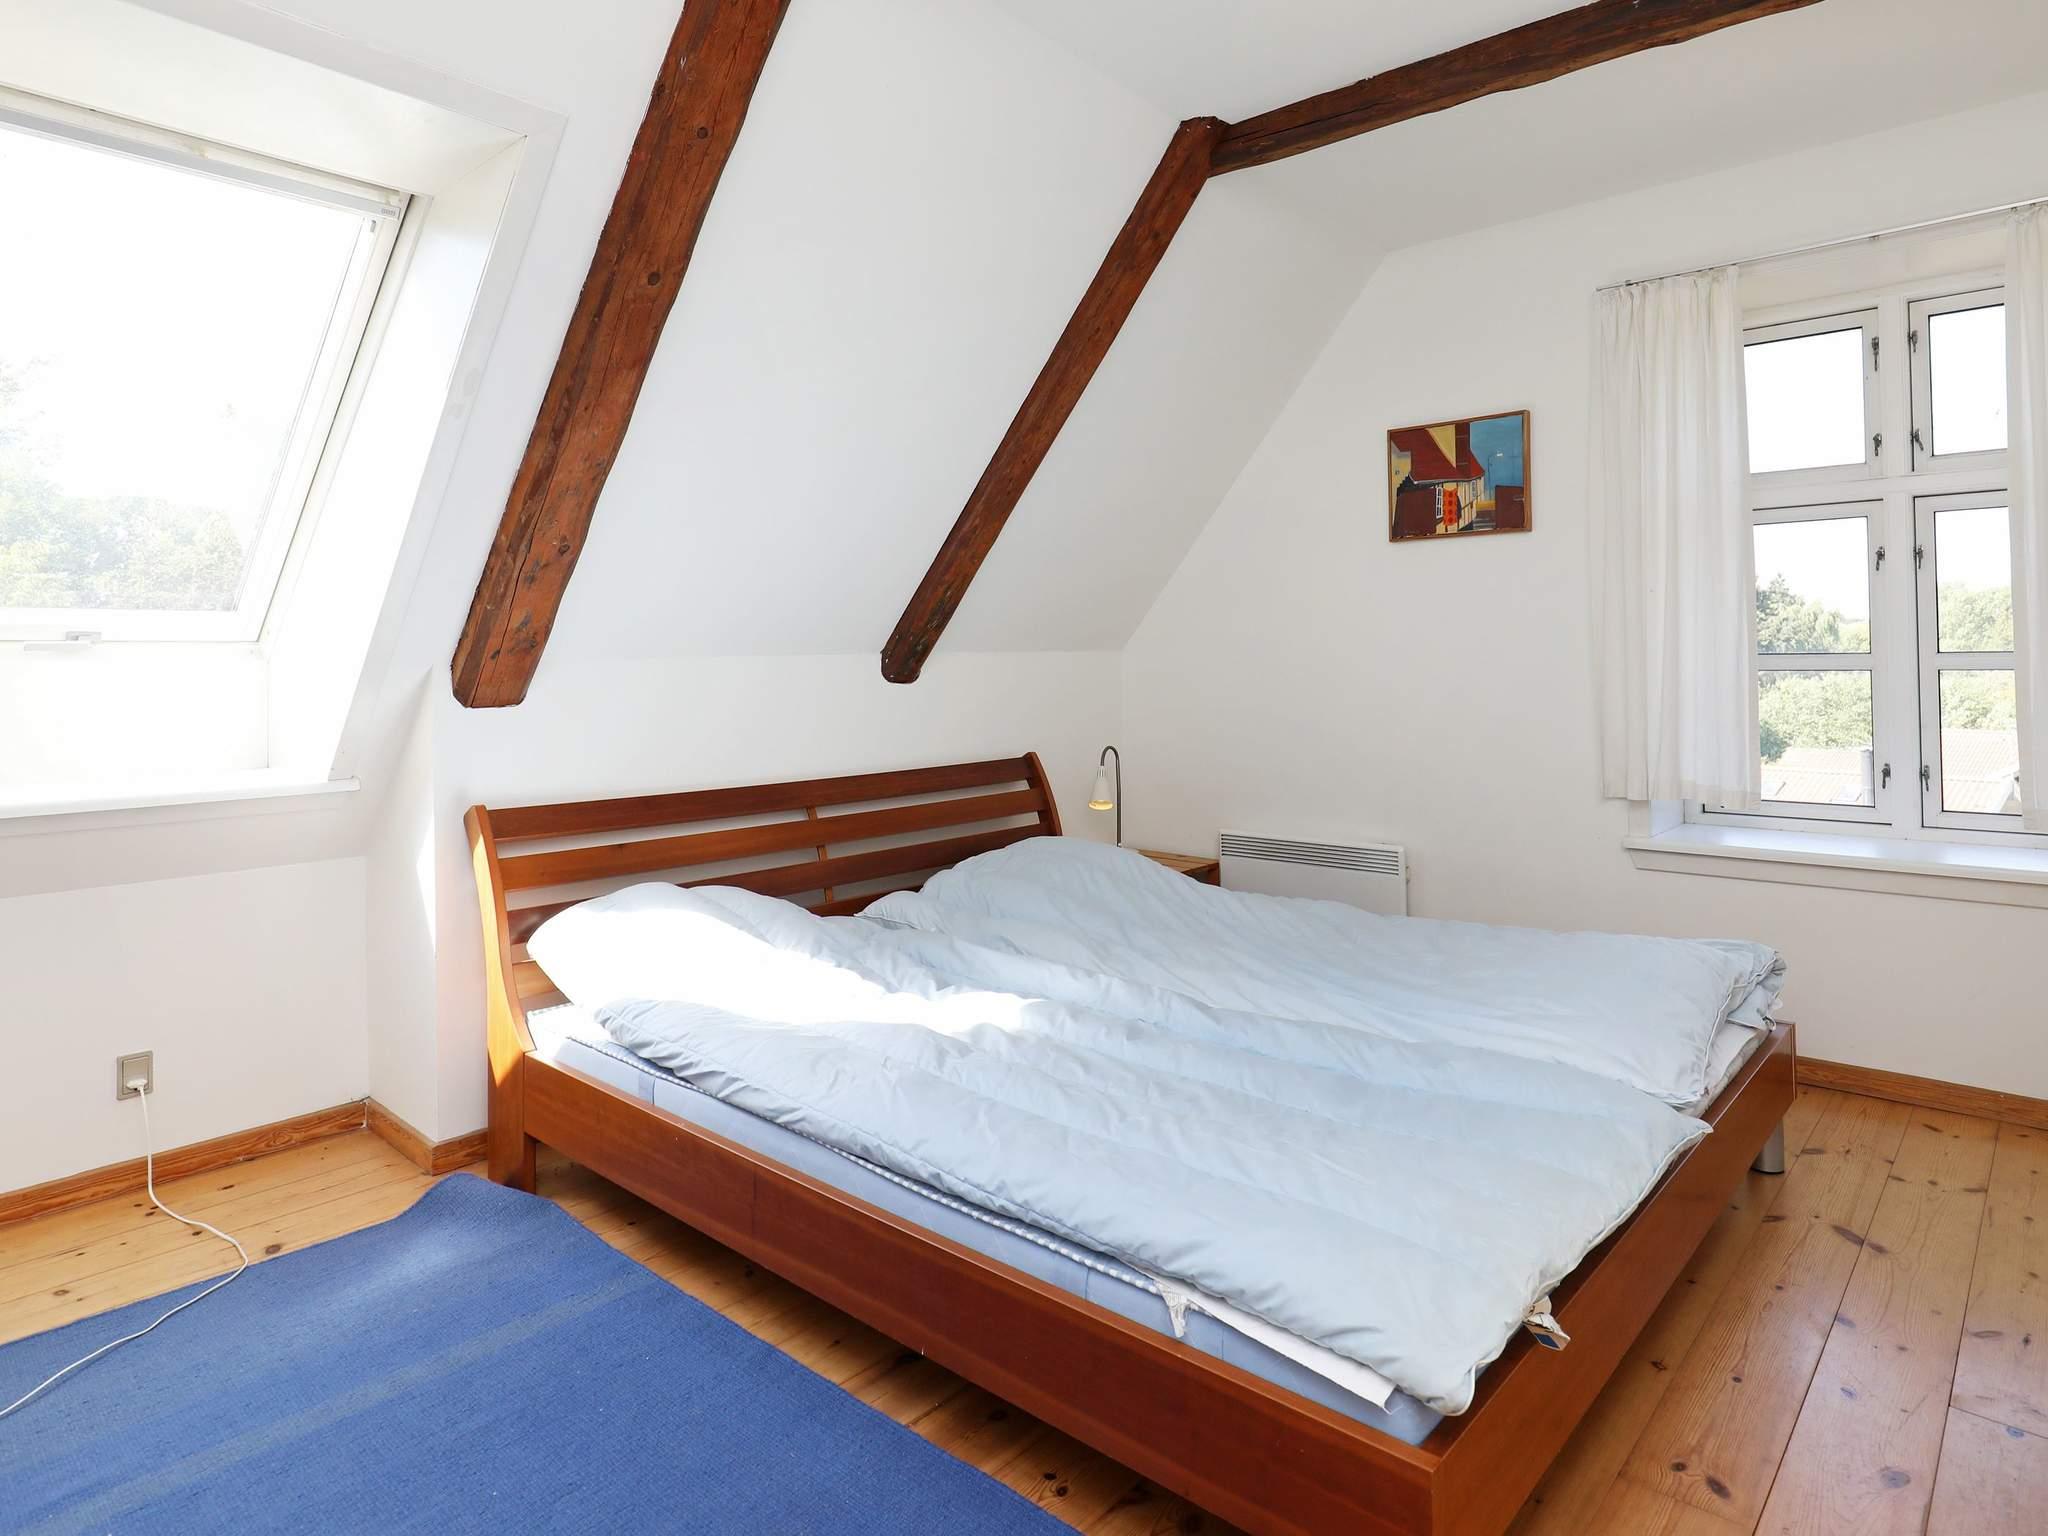 Ferienhaus Bukkemose (2453155), Humble, , Langeland, Dänemark, Bild 16